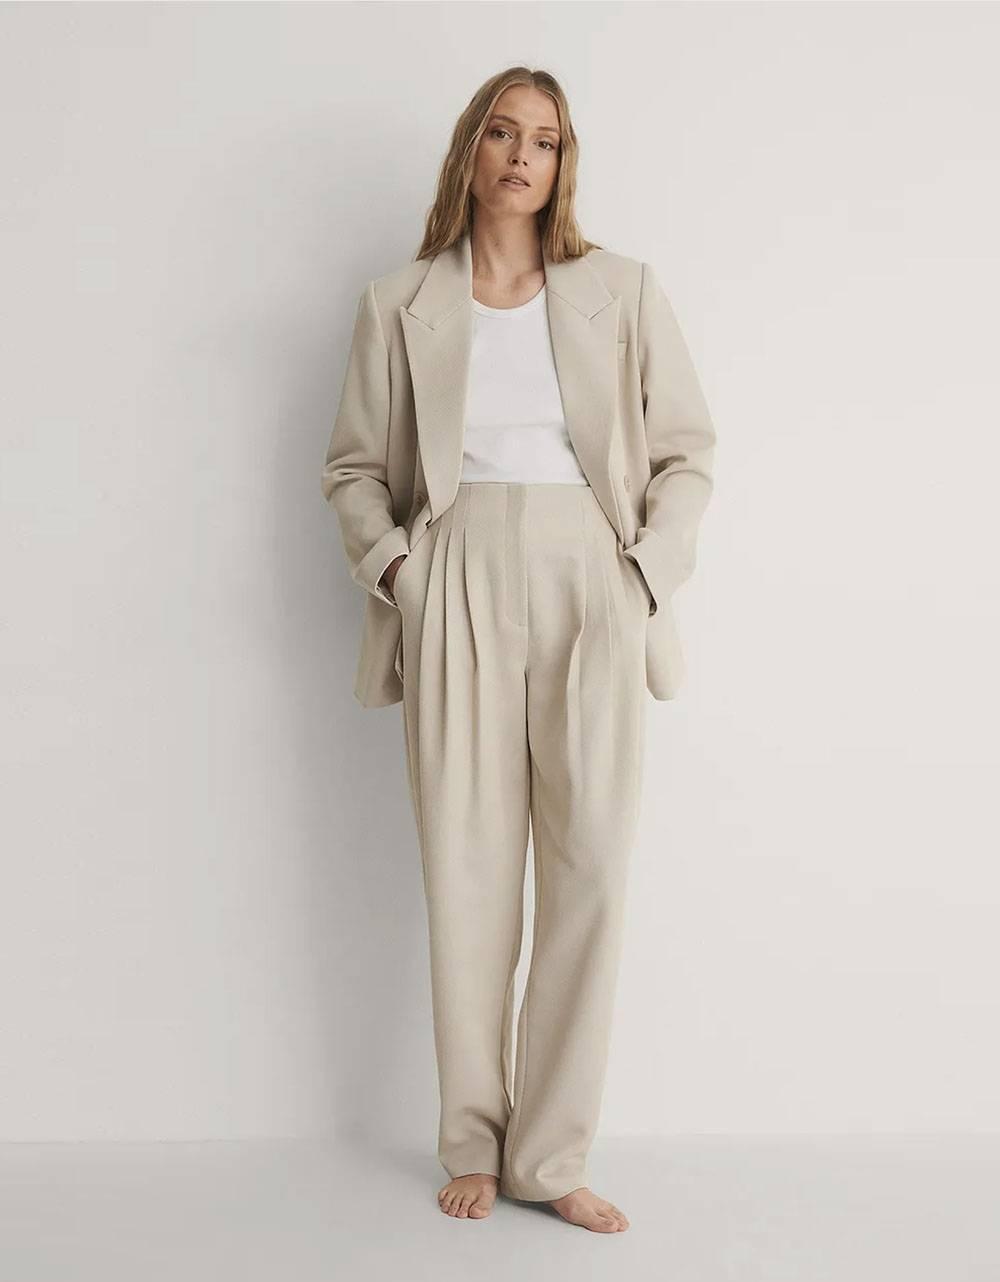 NA-KD darted twill pants - sand NA-KD Pants 65,57€